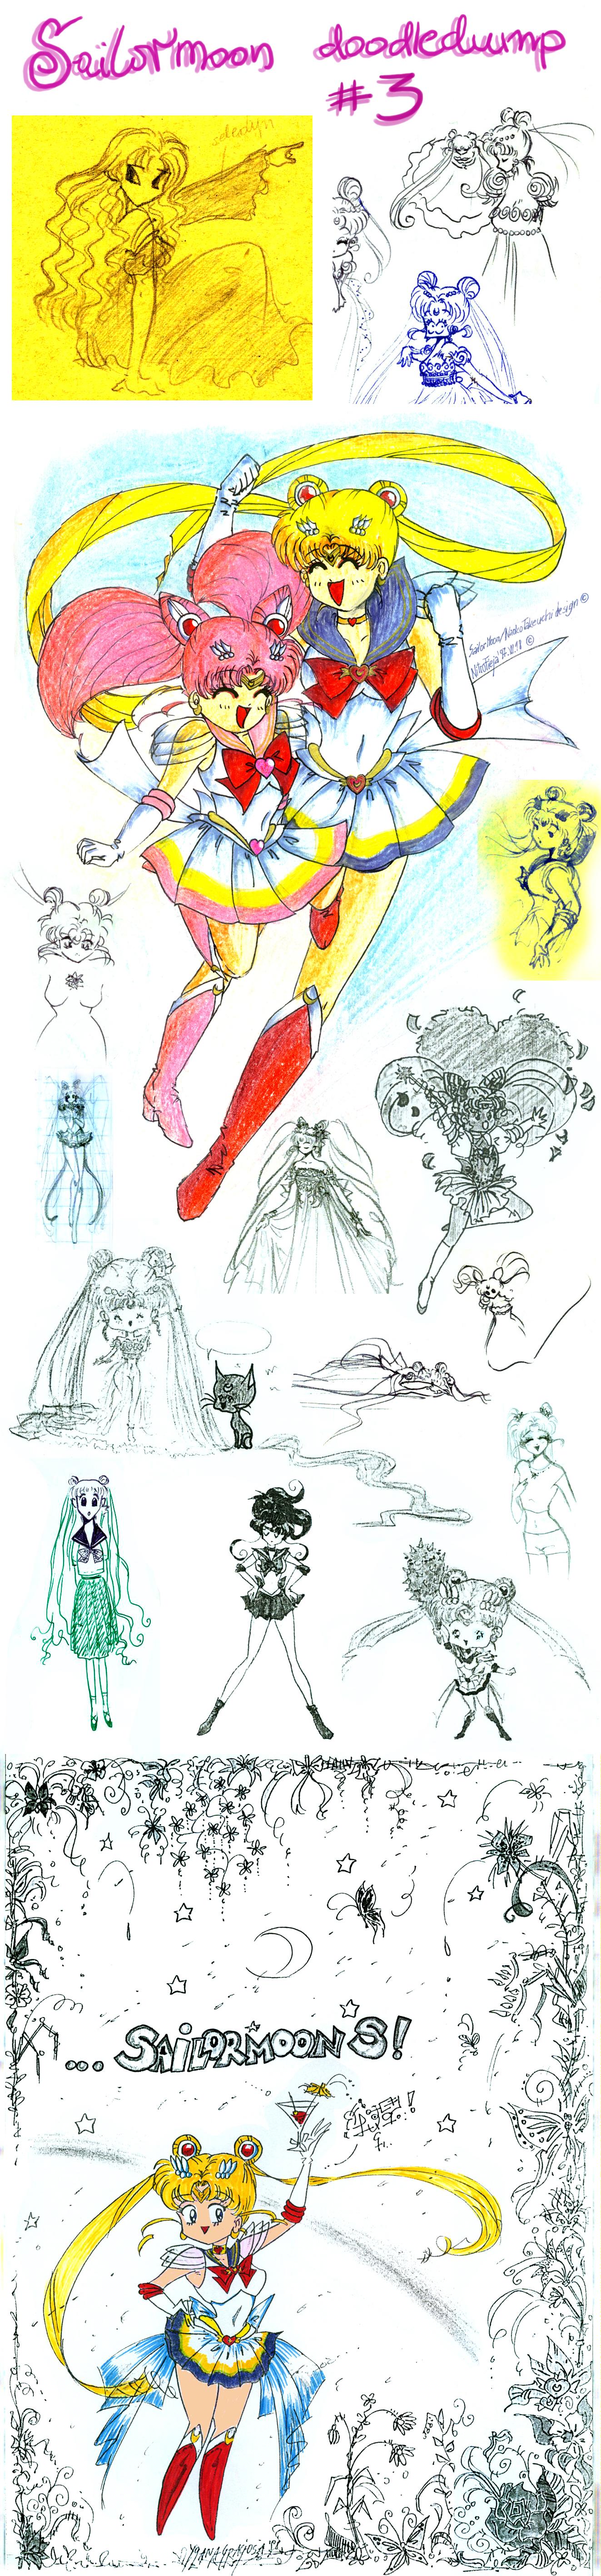 Sailormoon doodledump 3 by NitroFieja